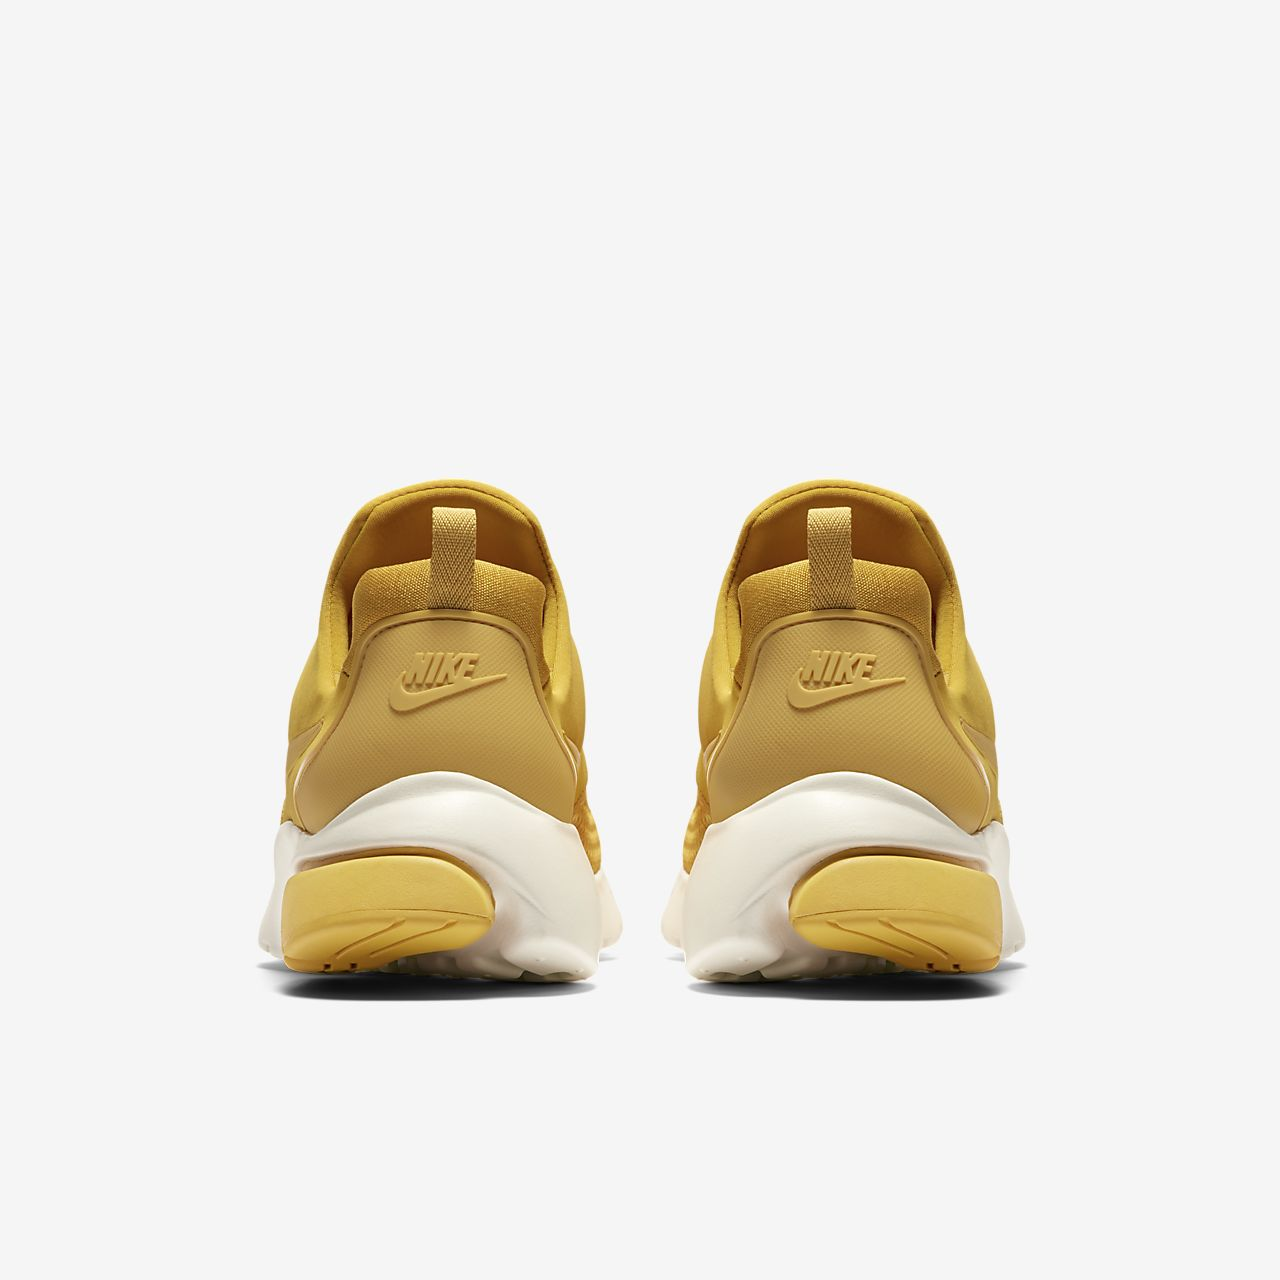 Nike Air Presto Fly Fly Presto SE Herrenschuh ffda26